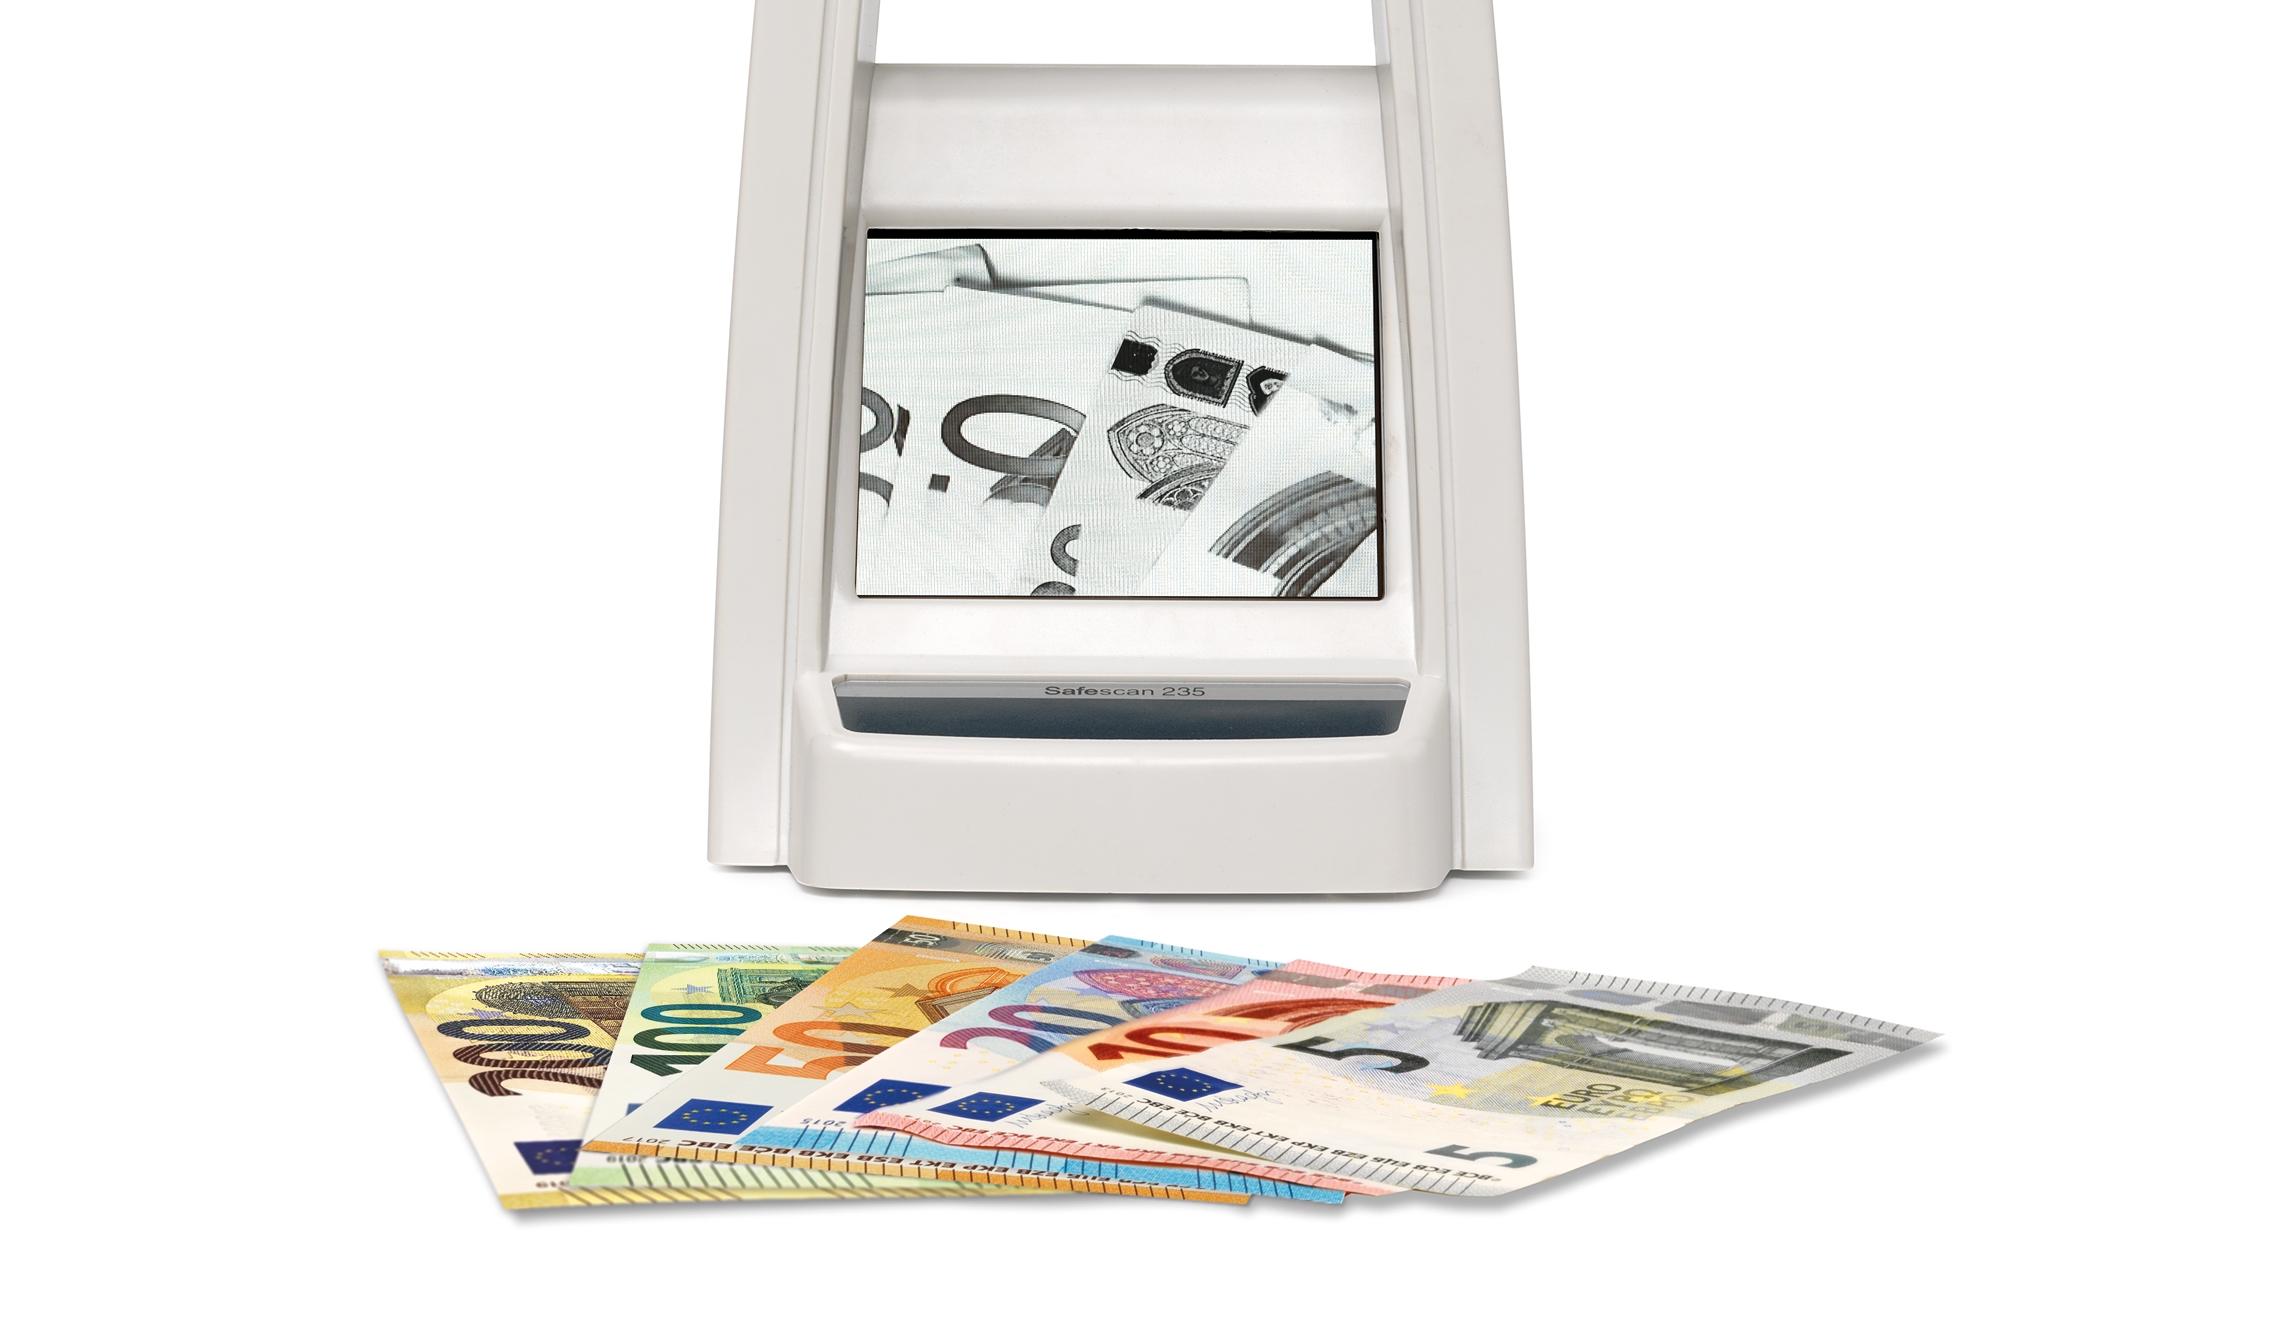 safescan-235-detecteert-infraroodkenmerken-van-bankbiljetten